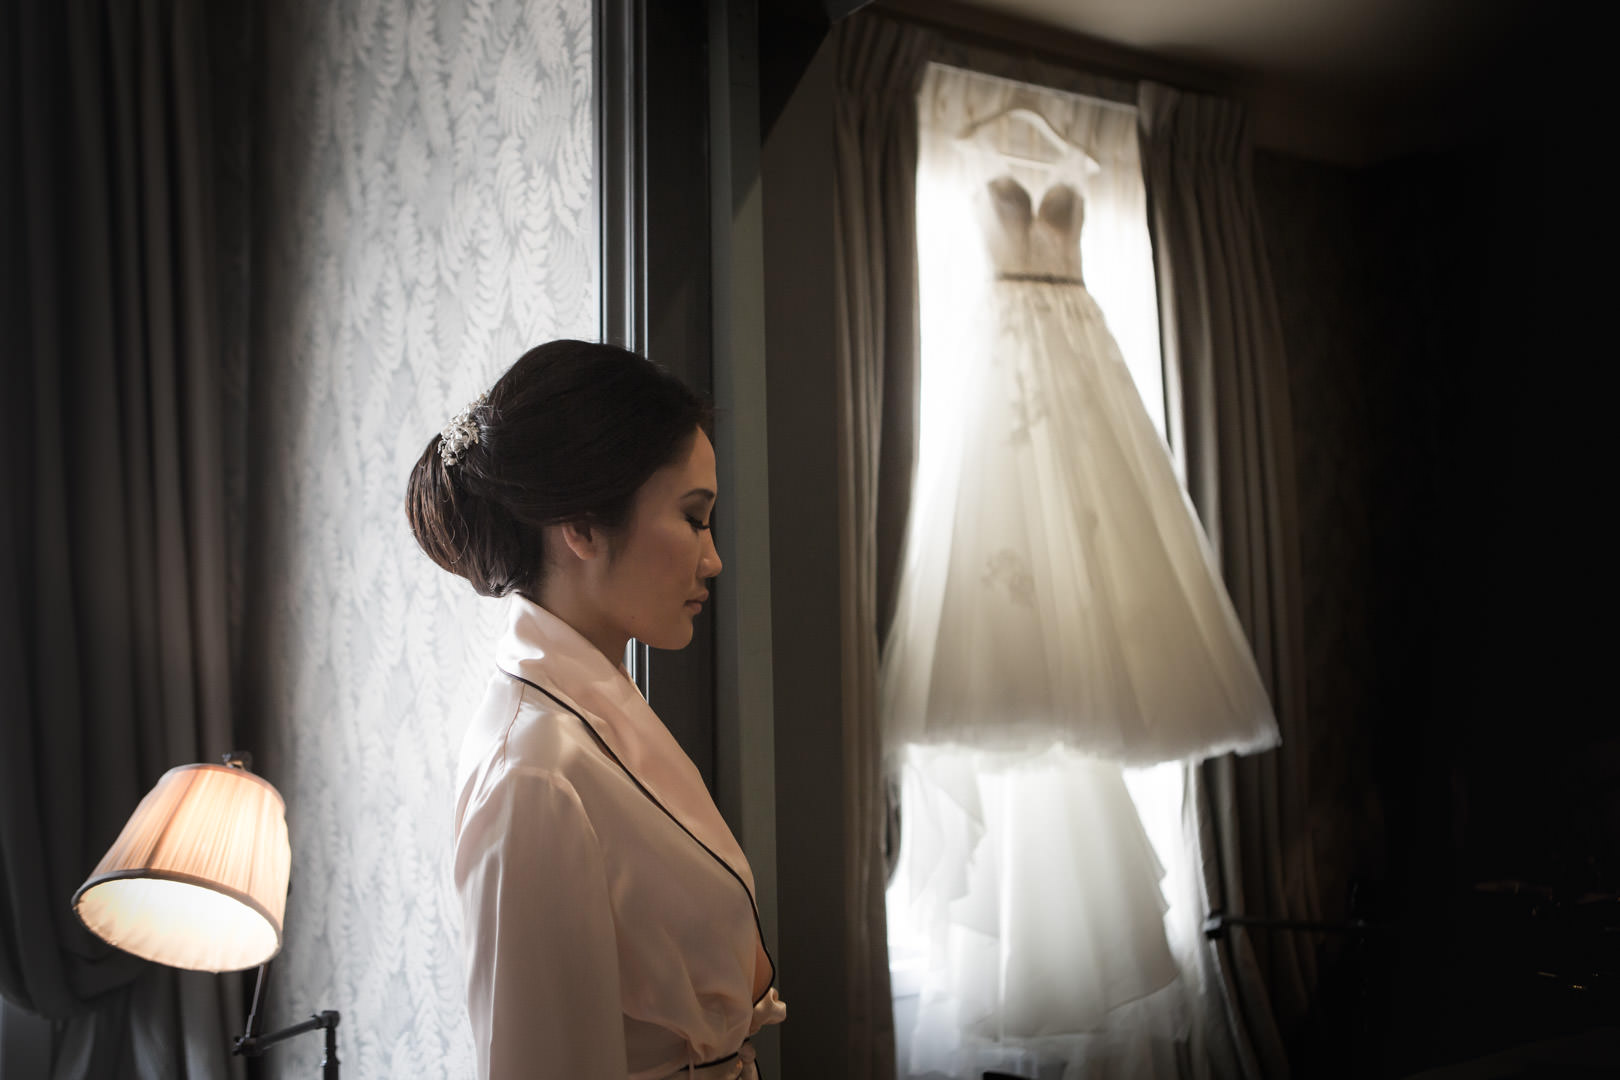 la mariée s'apprête à enfiler sa robe, moment intime.